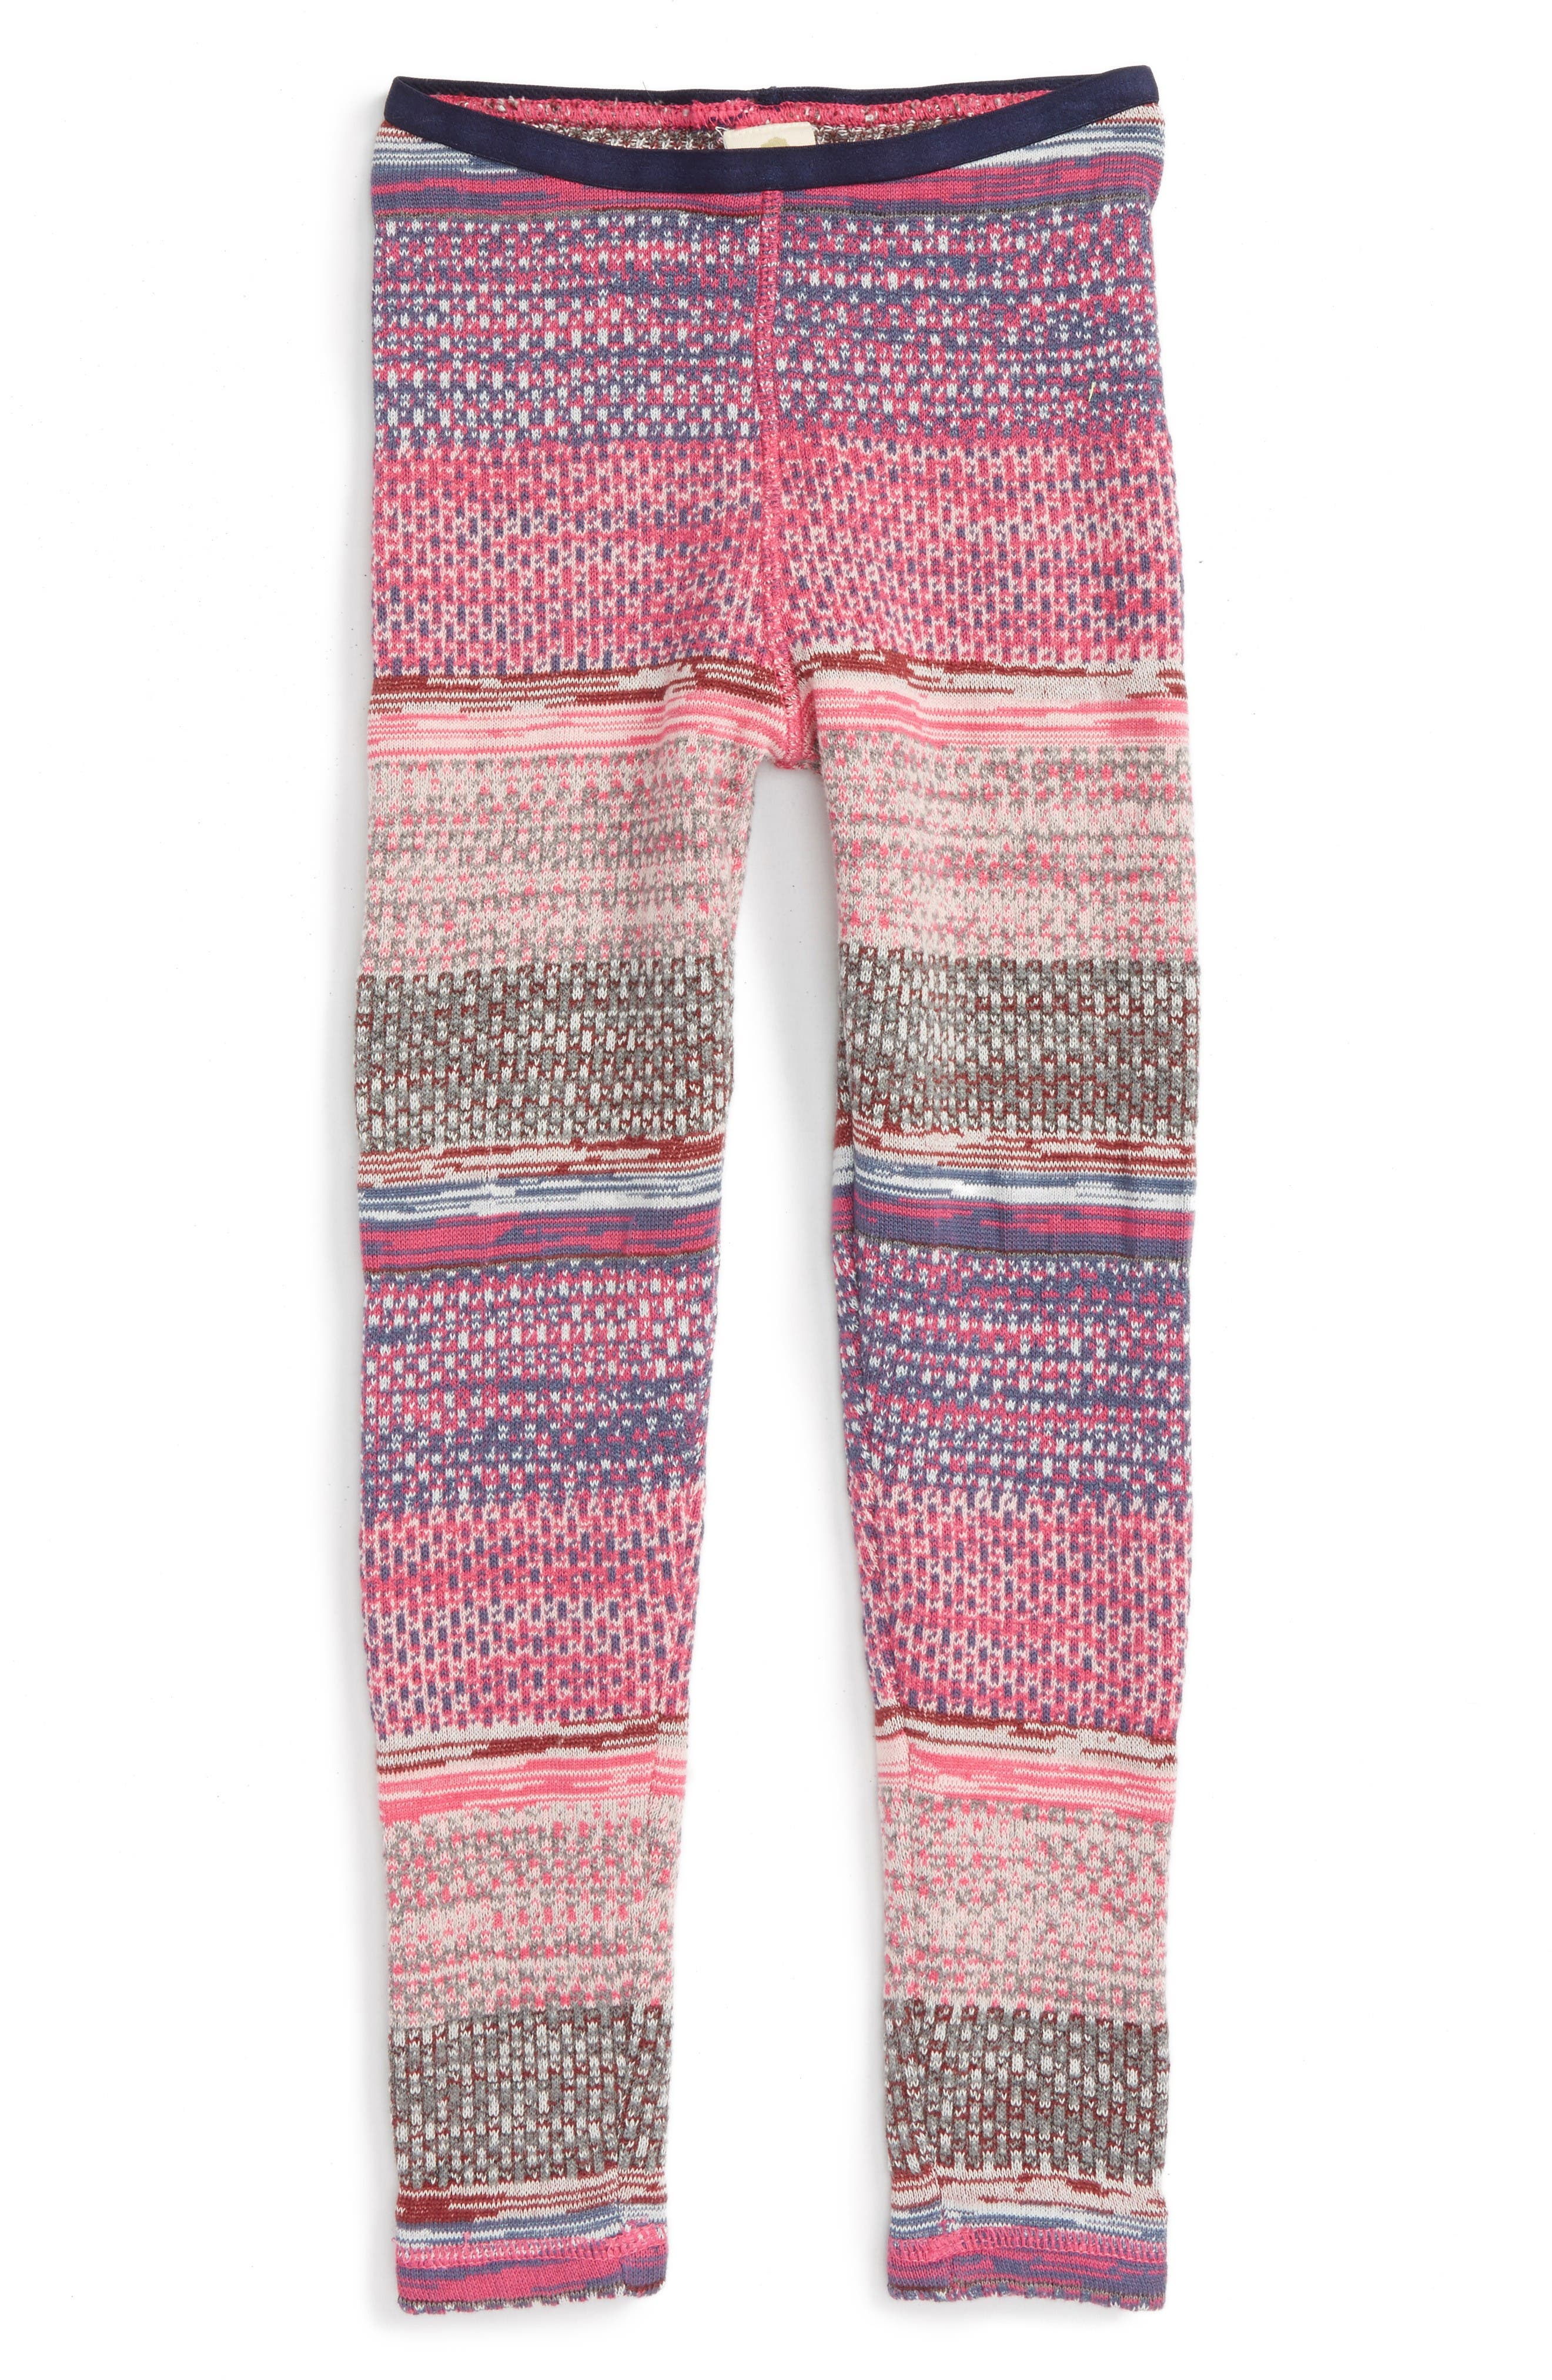 Pattern Knit Leggings,                         Main,                         color, Pink Magenta Spacedye